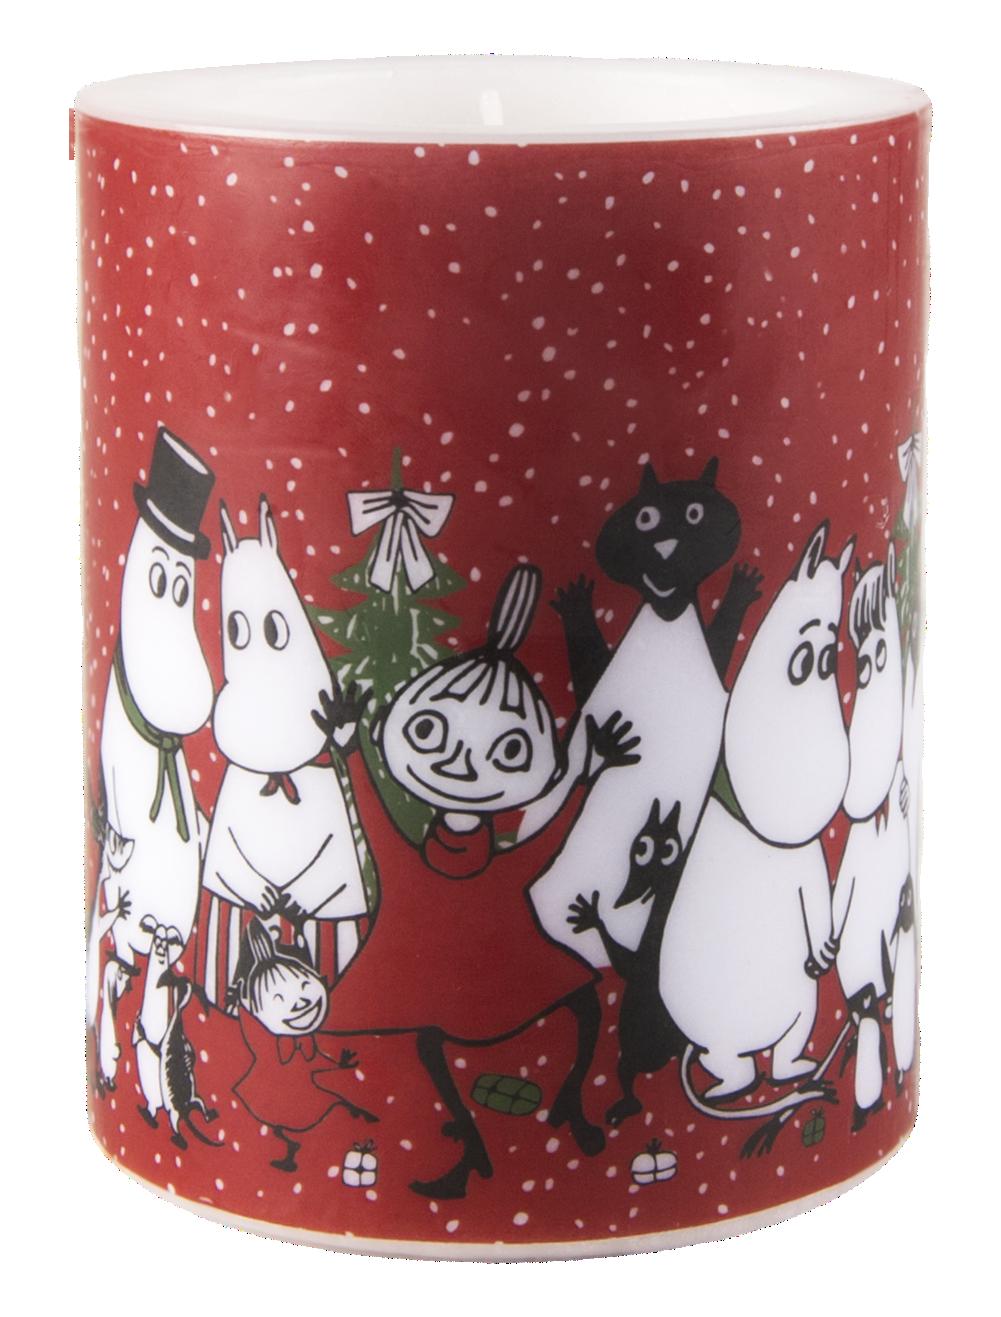 Muurla Moomin Winter Magic candle 12cm